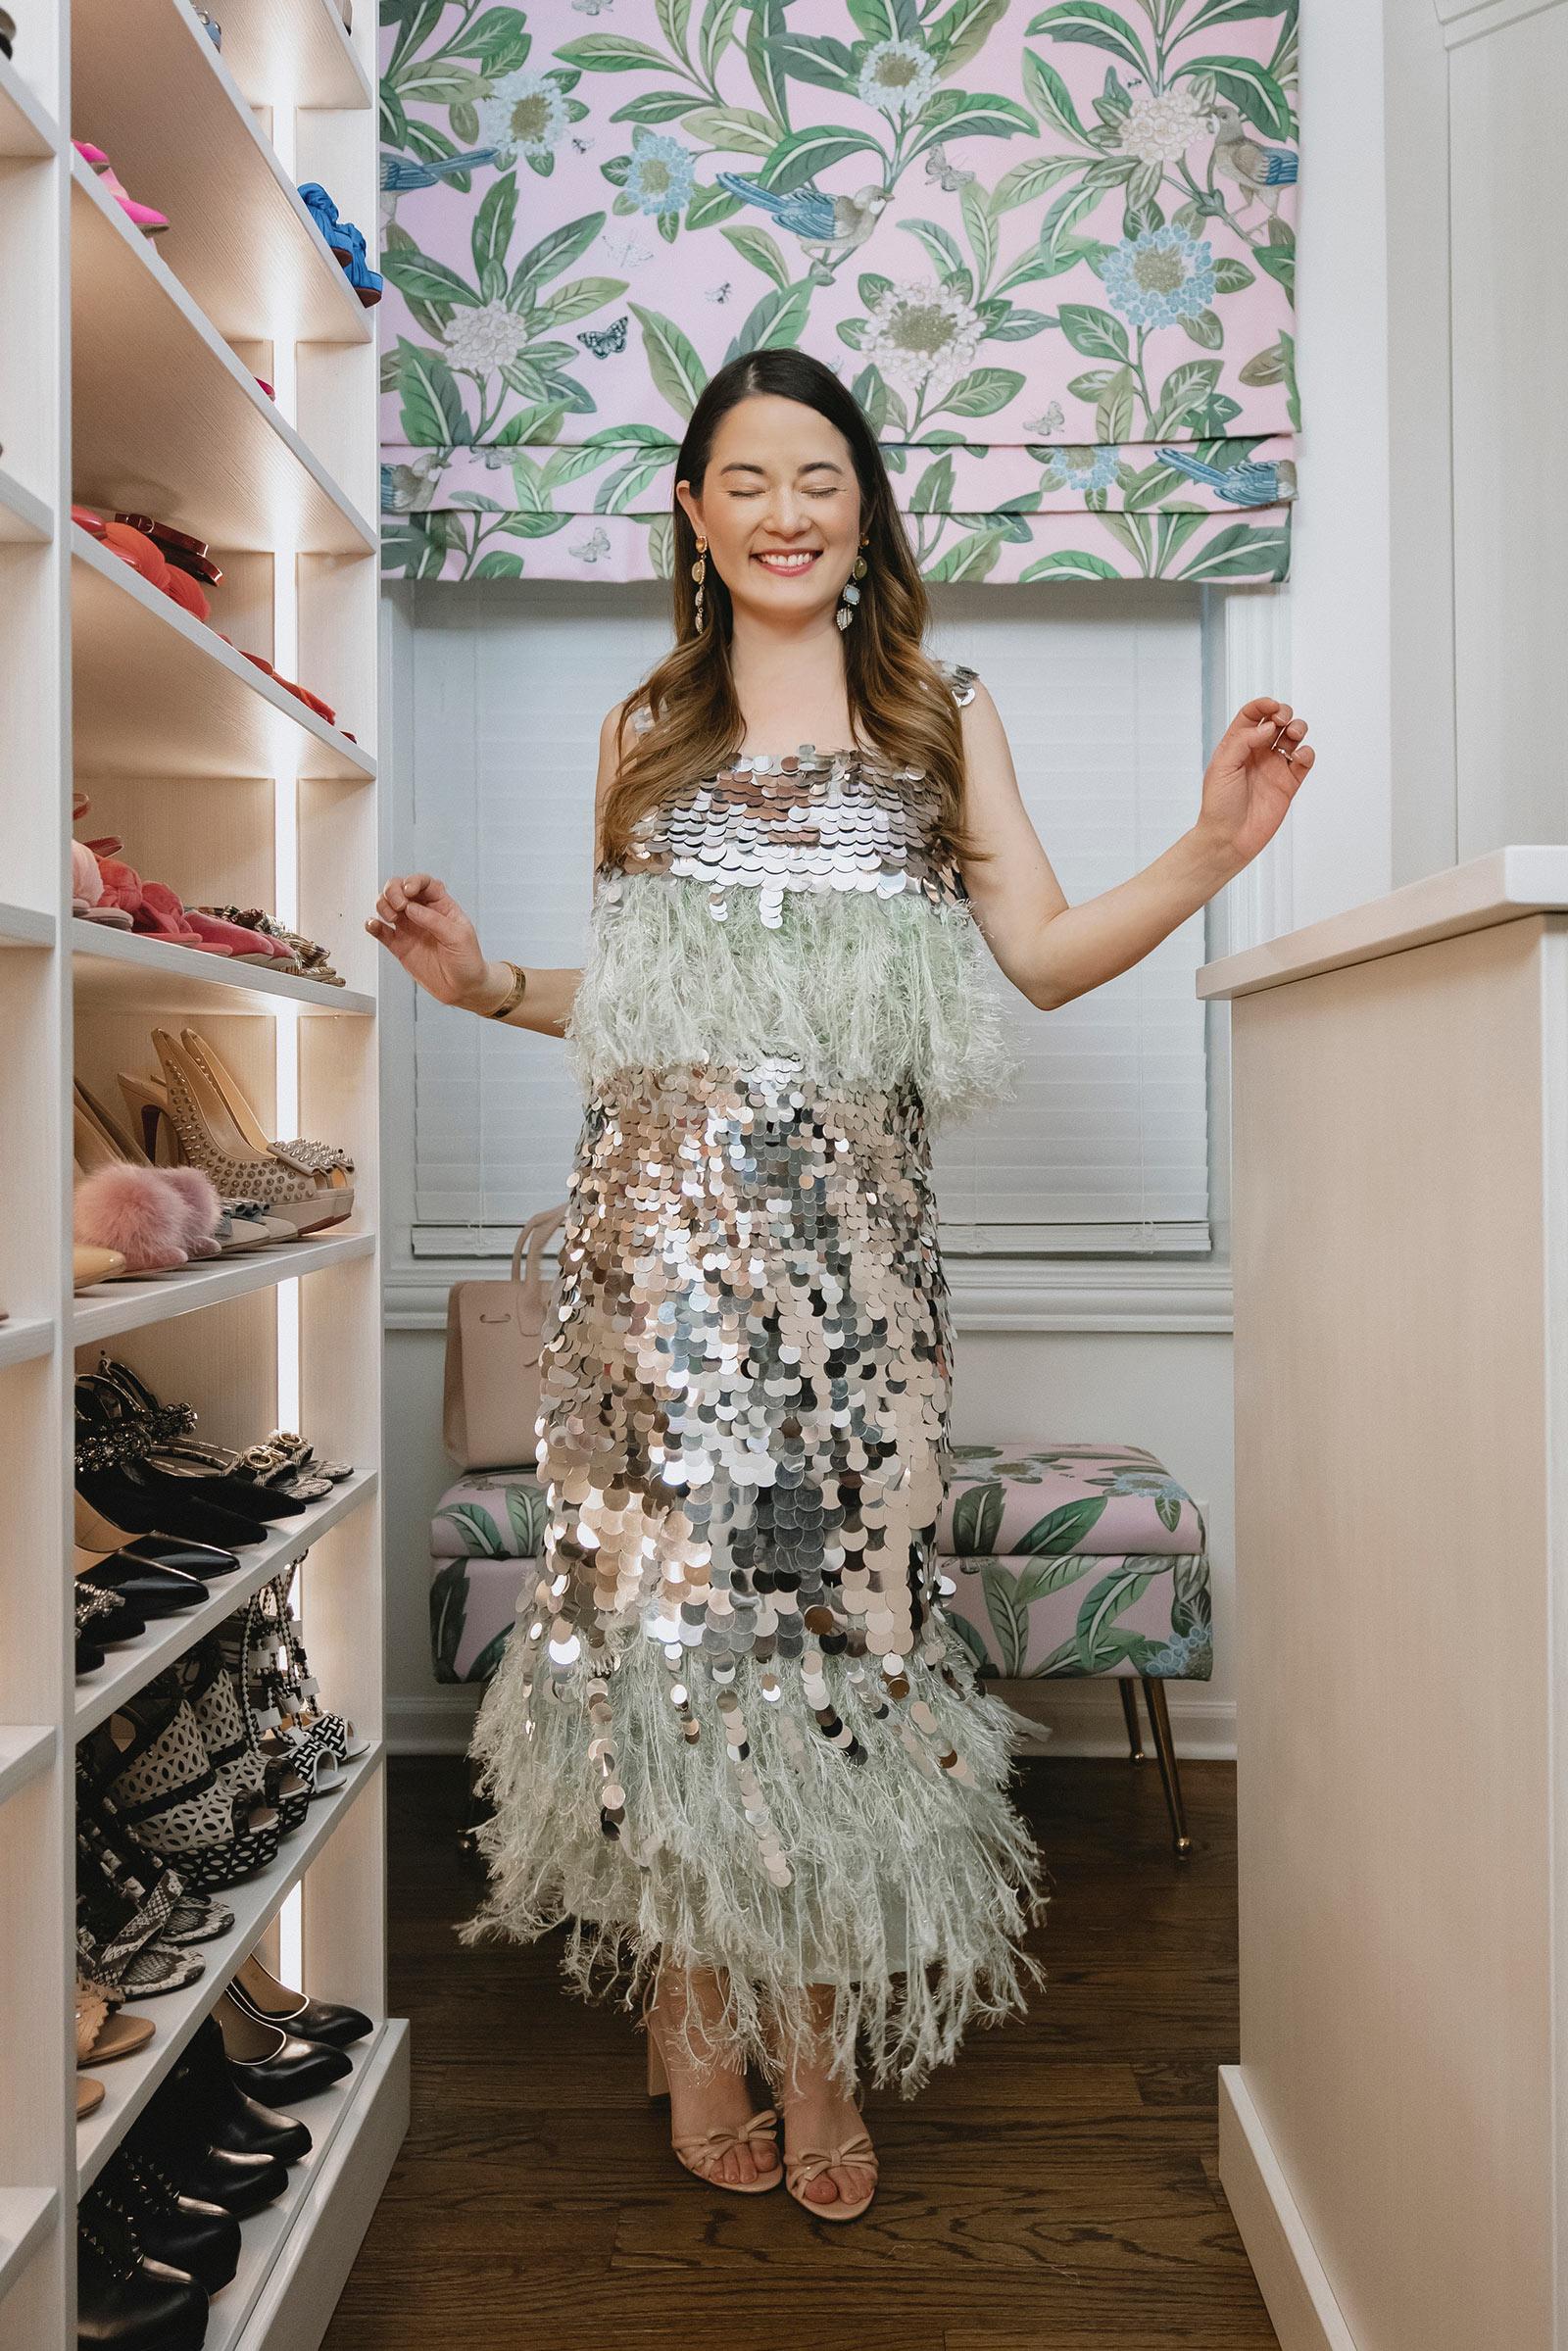 ASOS Sequin Fringe Dress